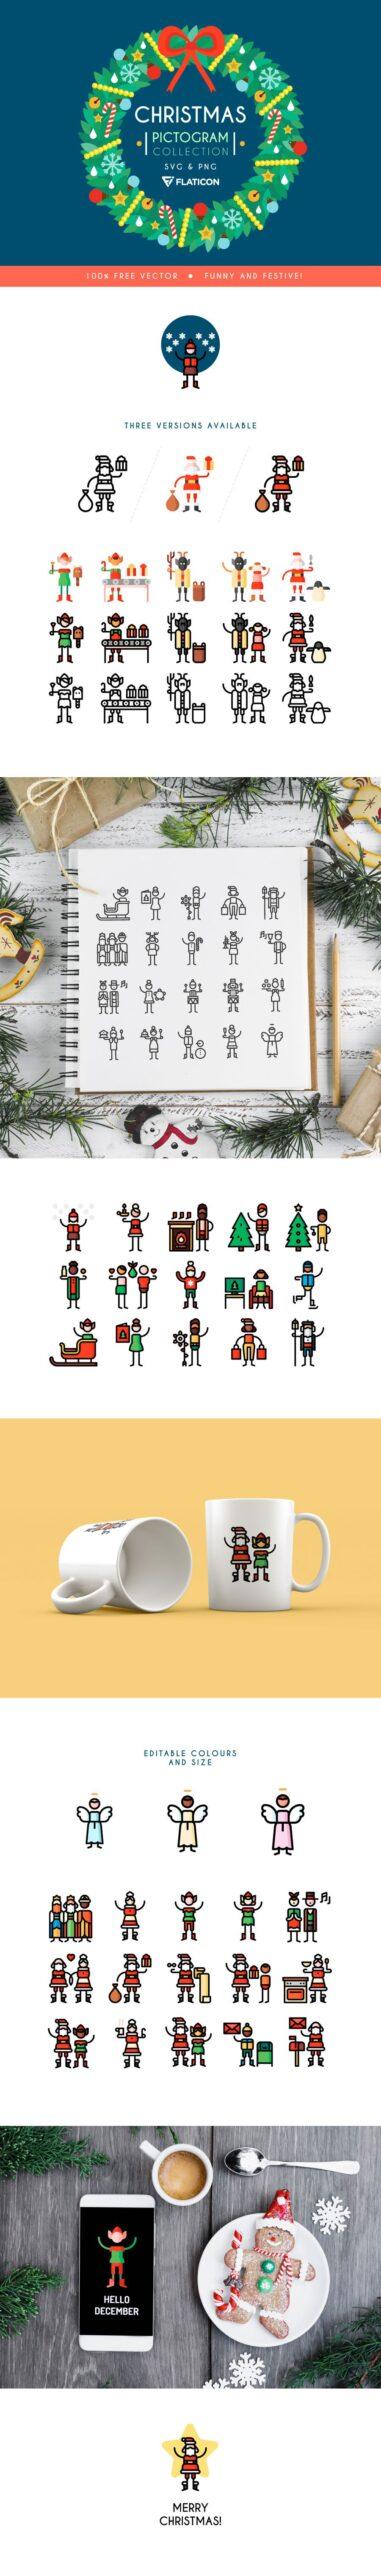 colección gratuita de pictogramas navideños